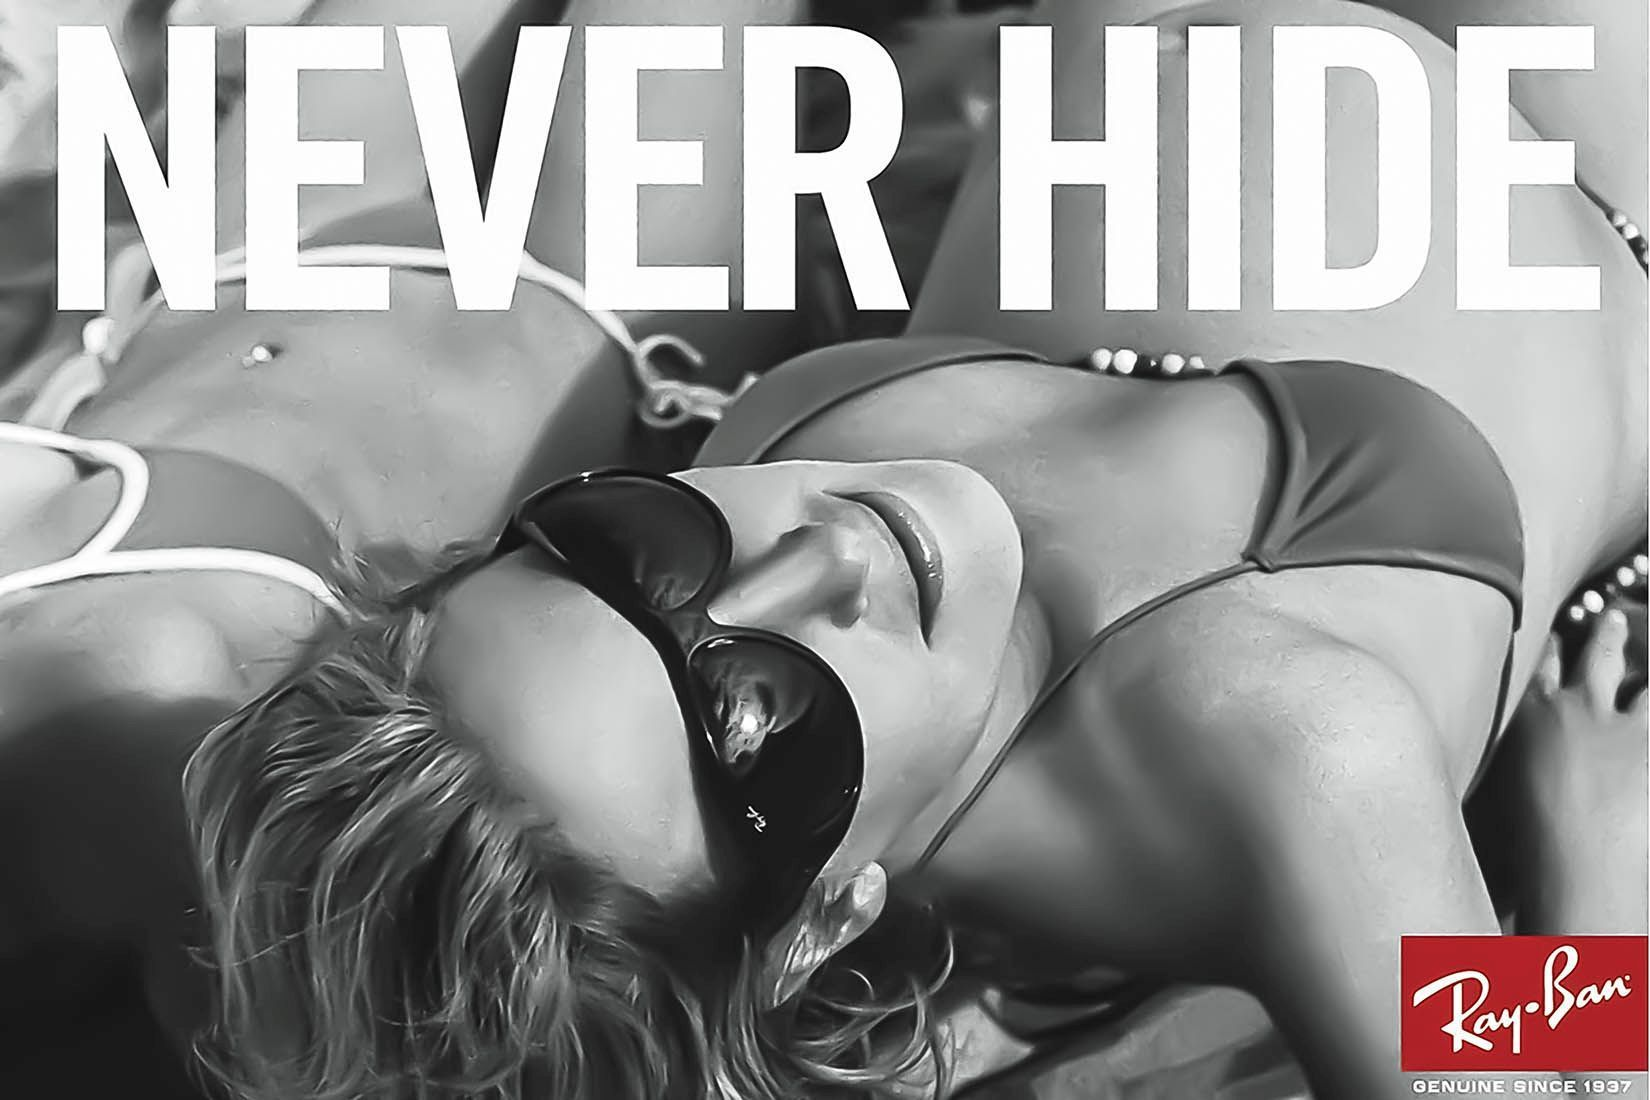 Ray-Ban Sunglasses Poster 8 1650x1100